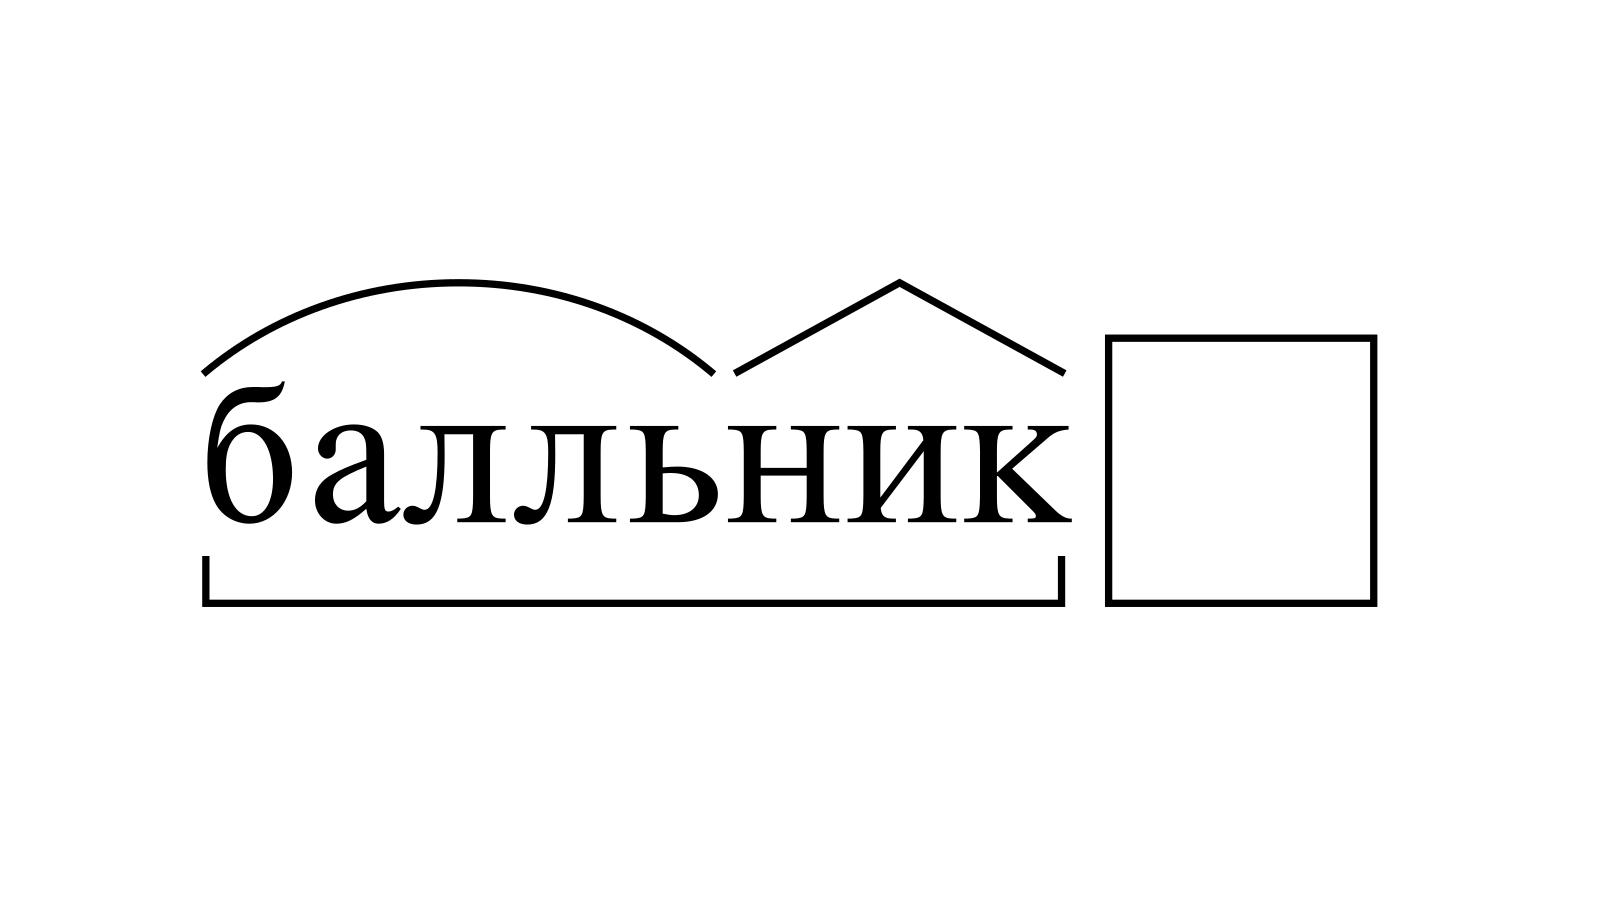 Разбор слова «балльник» по составу